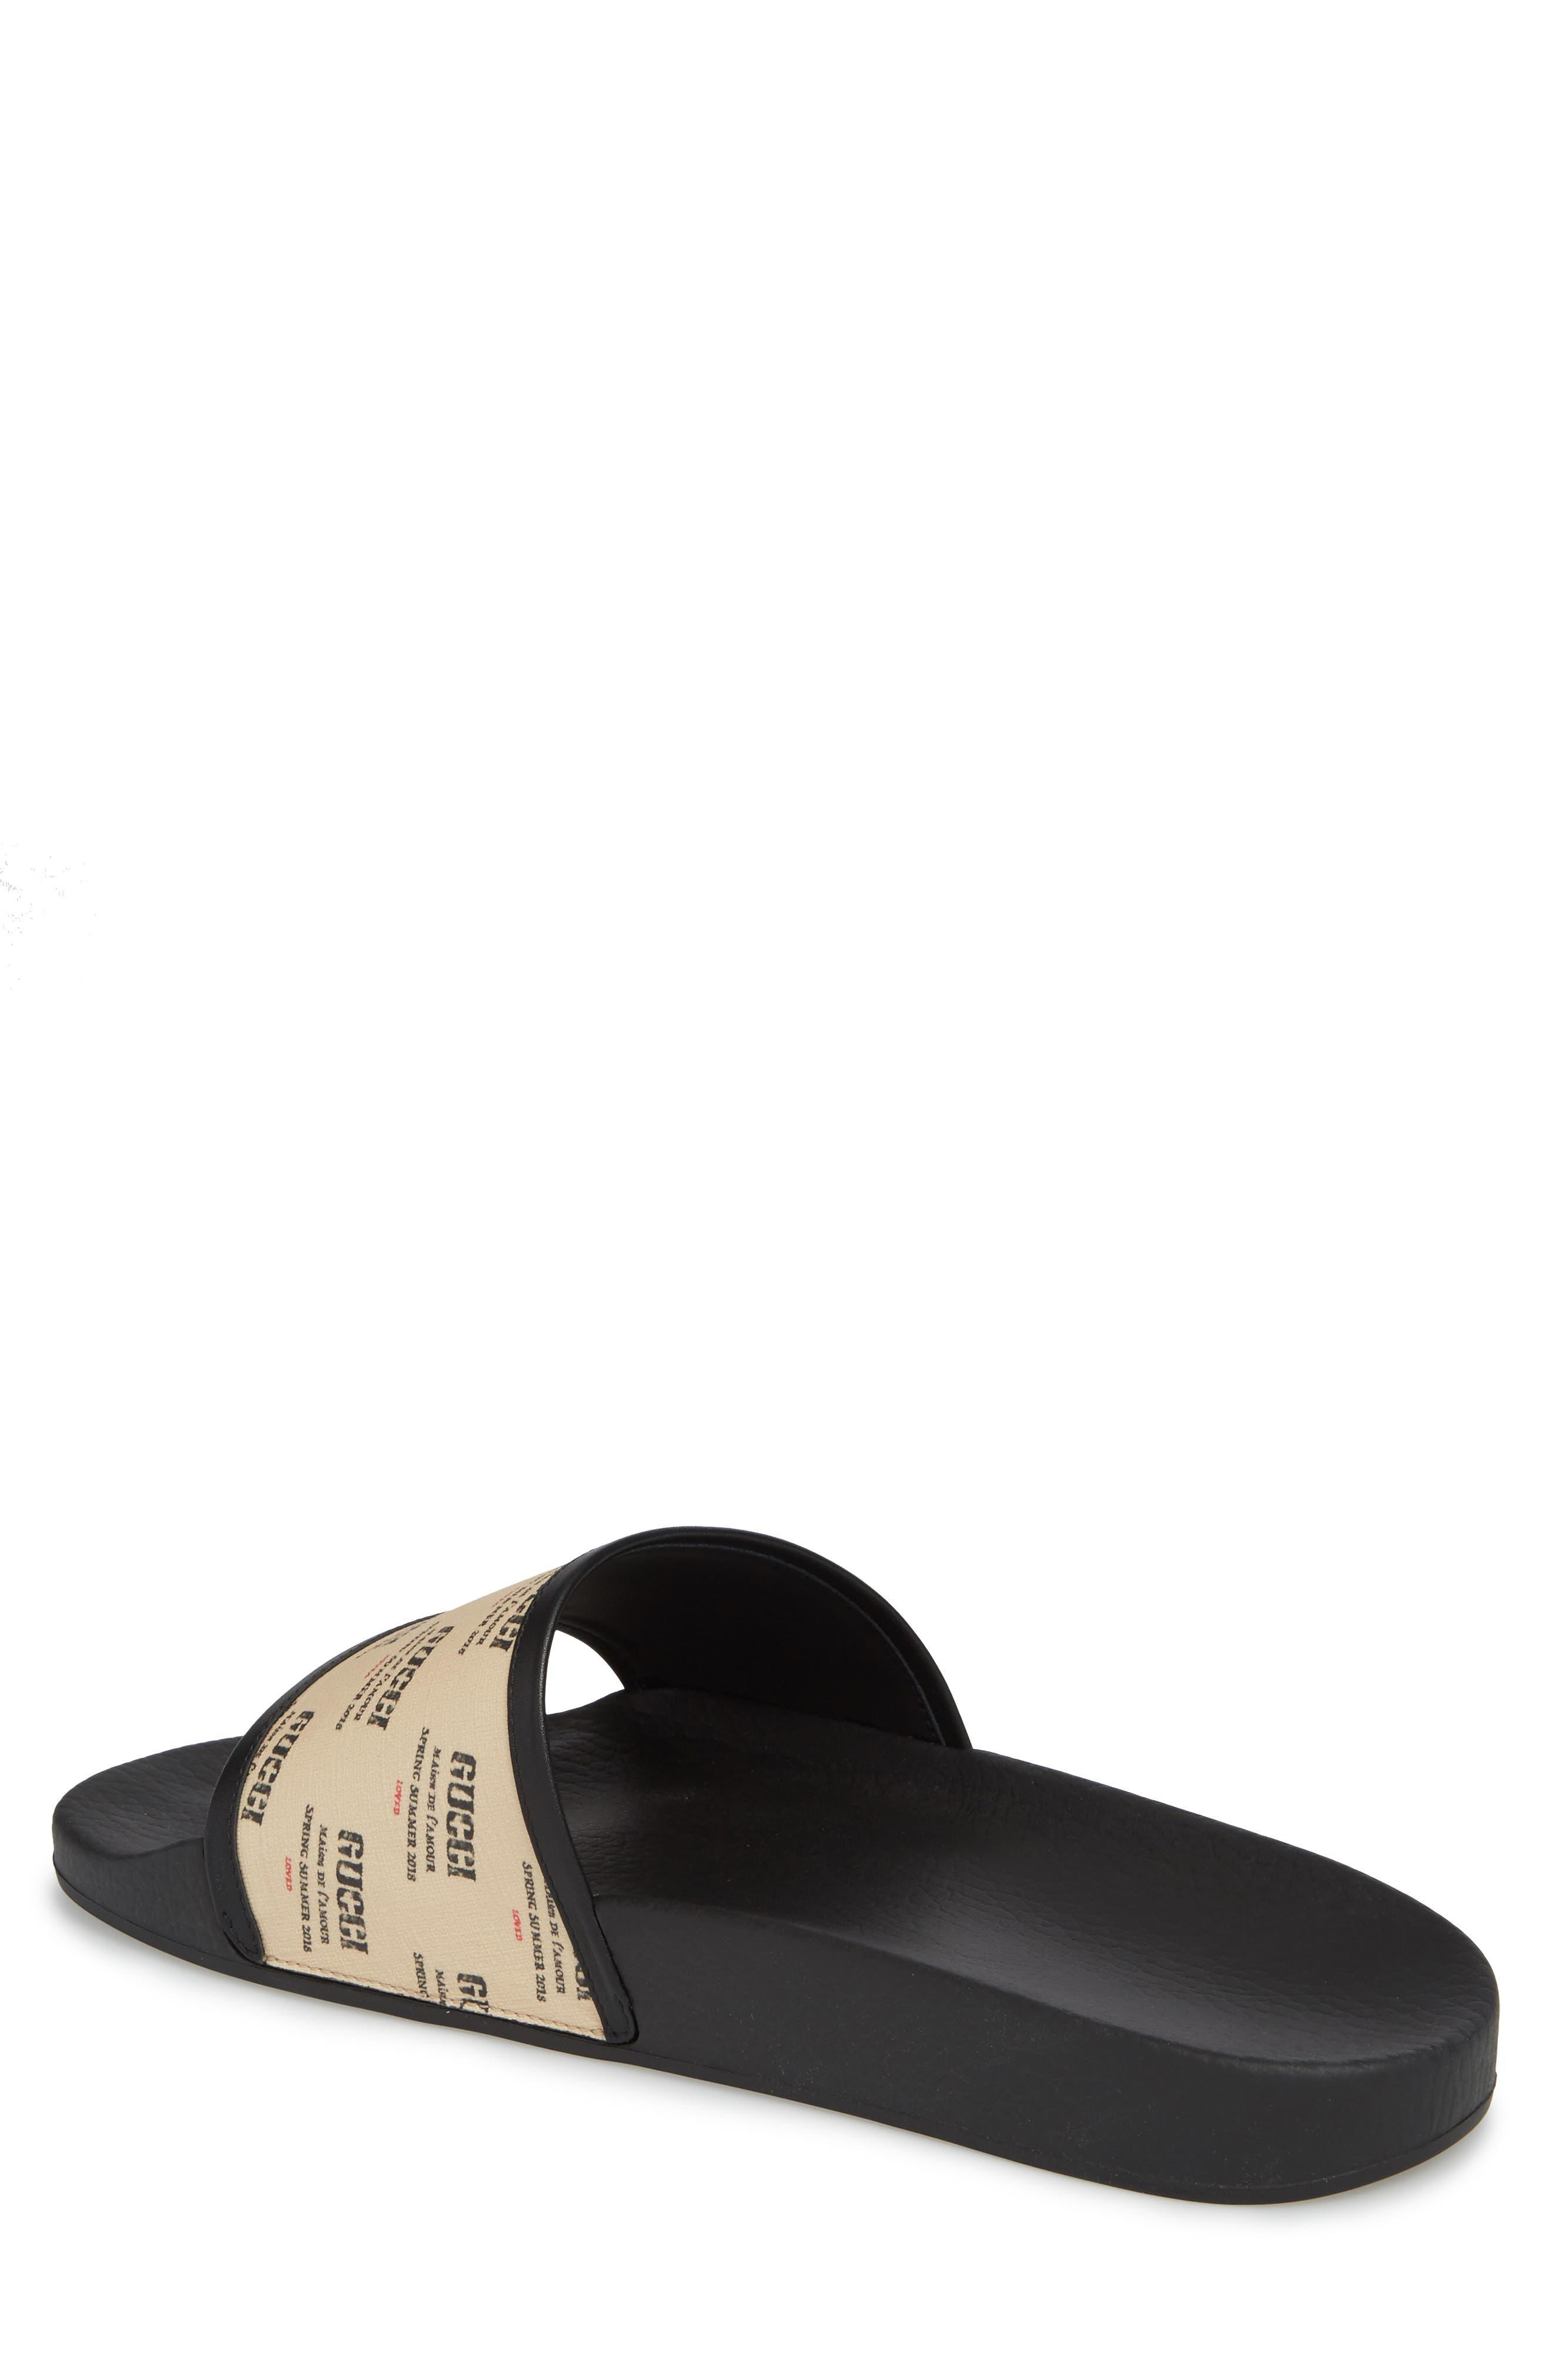 Invite Slide Sandal,                             Alternate thumbnail 2, color,                             Black Patino